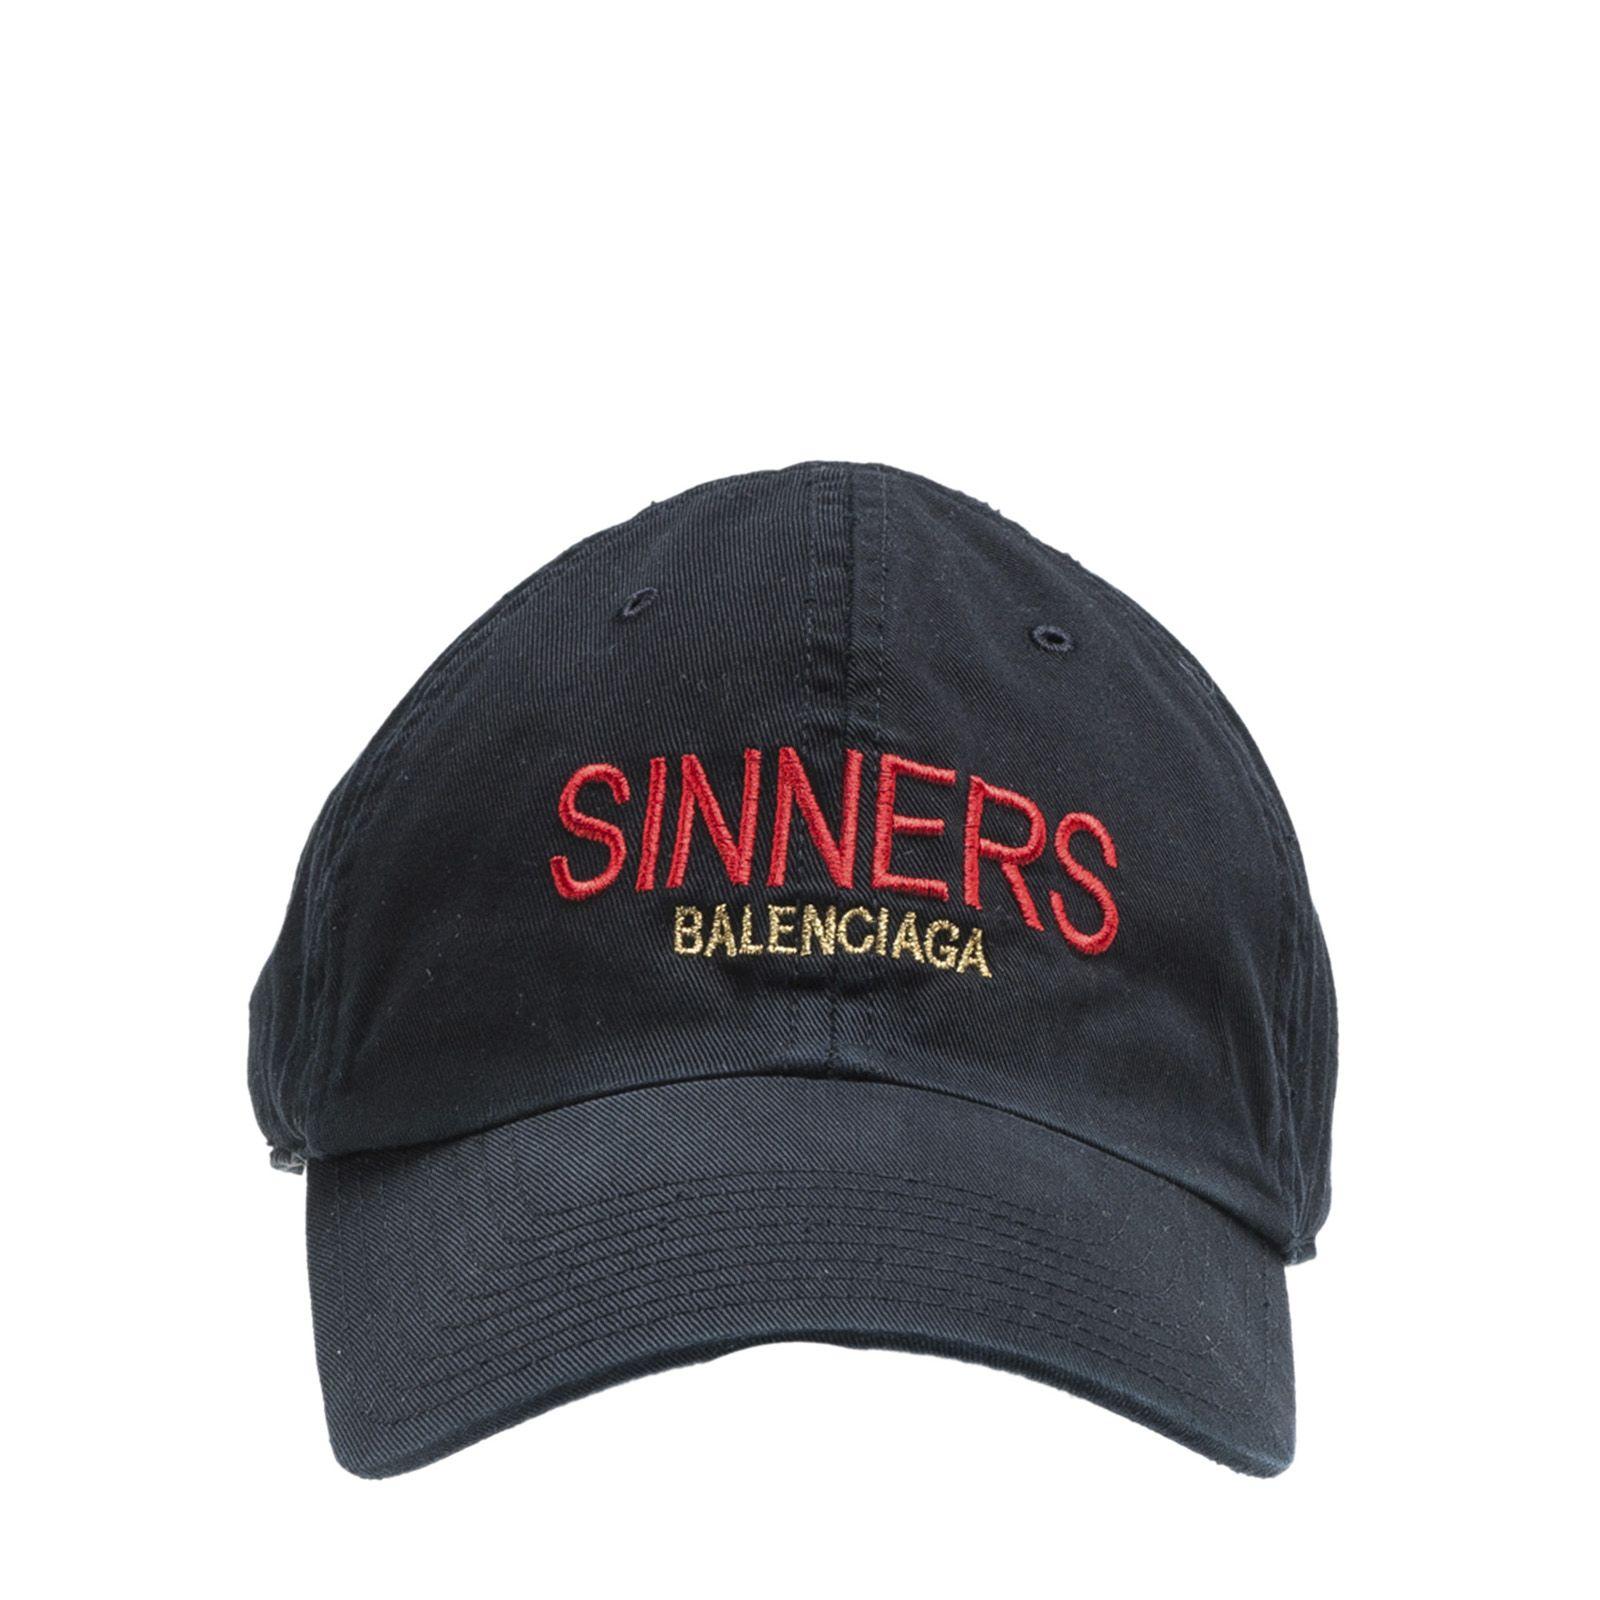 Sinners baseball cap - Black Balenciaga